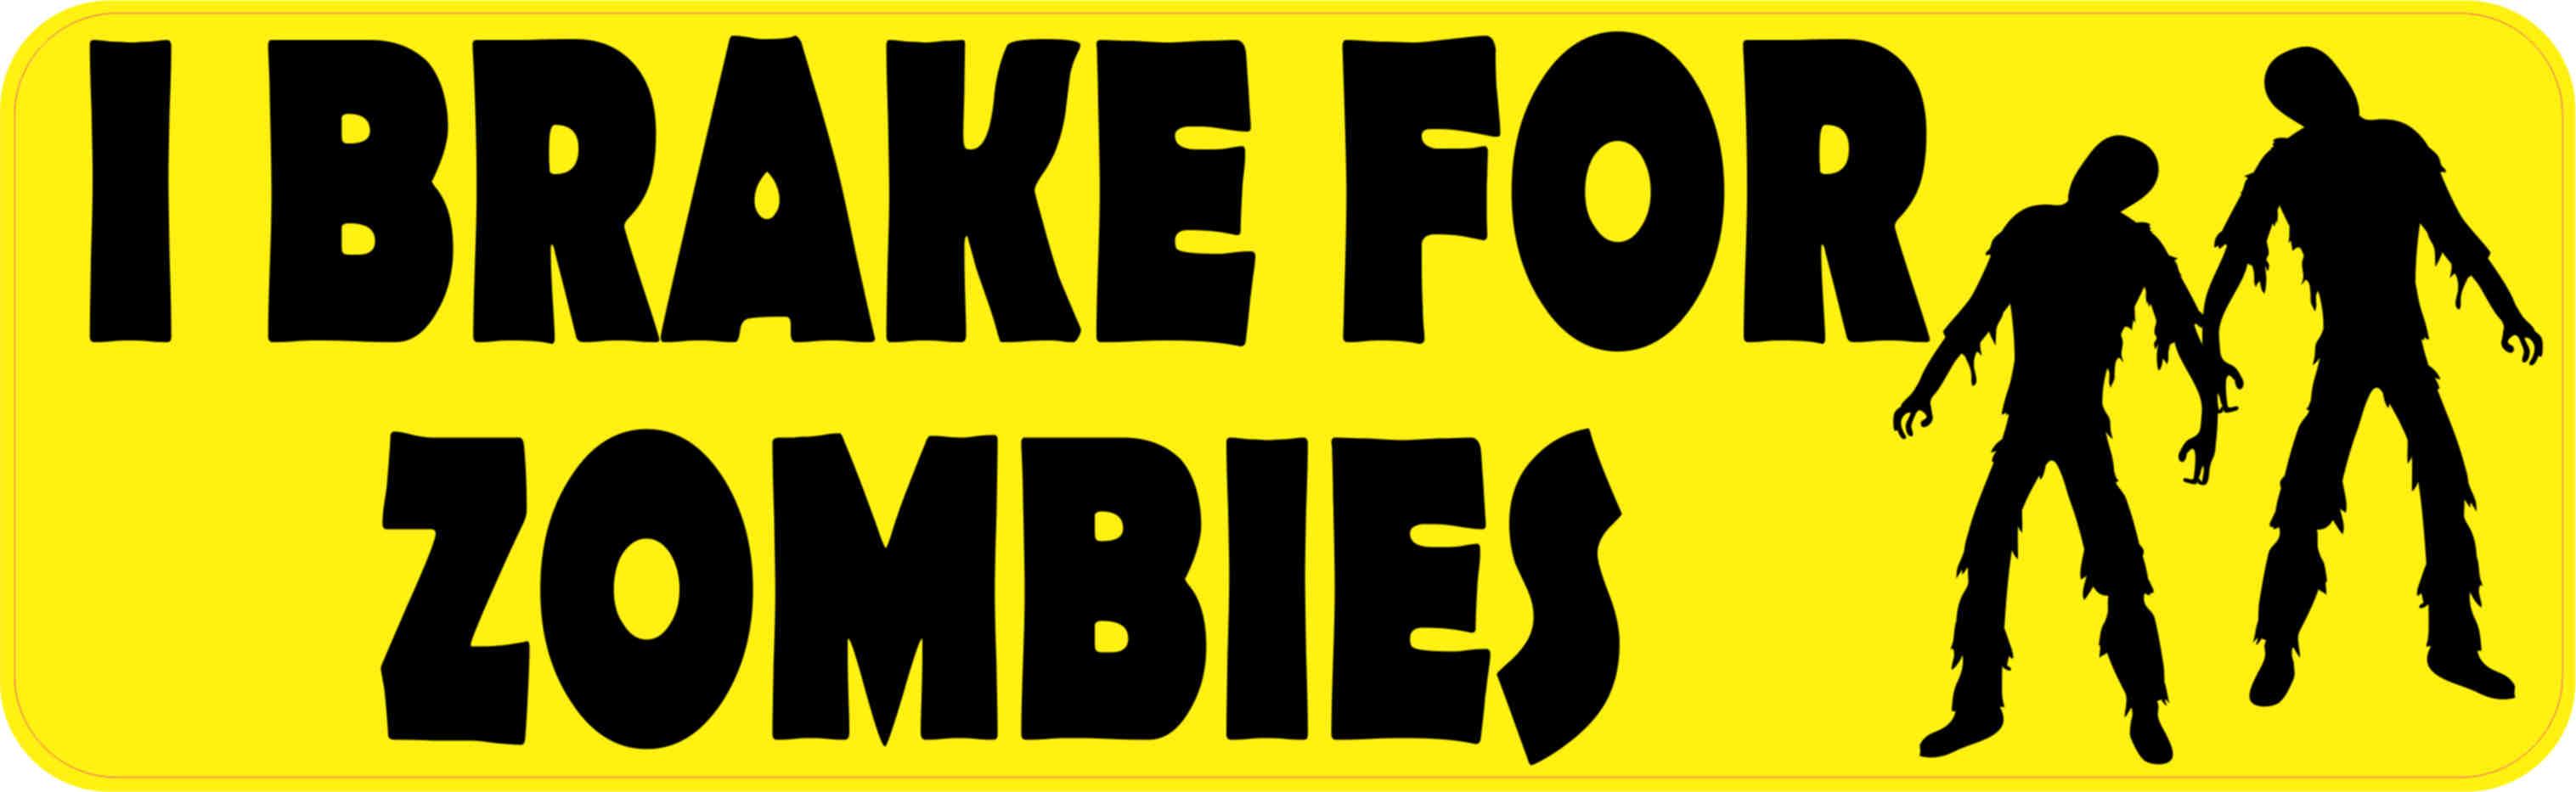 10in X 3in I Brake For Zombies Bumper Sticker Vinyl Halloween Stickers